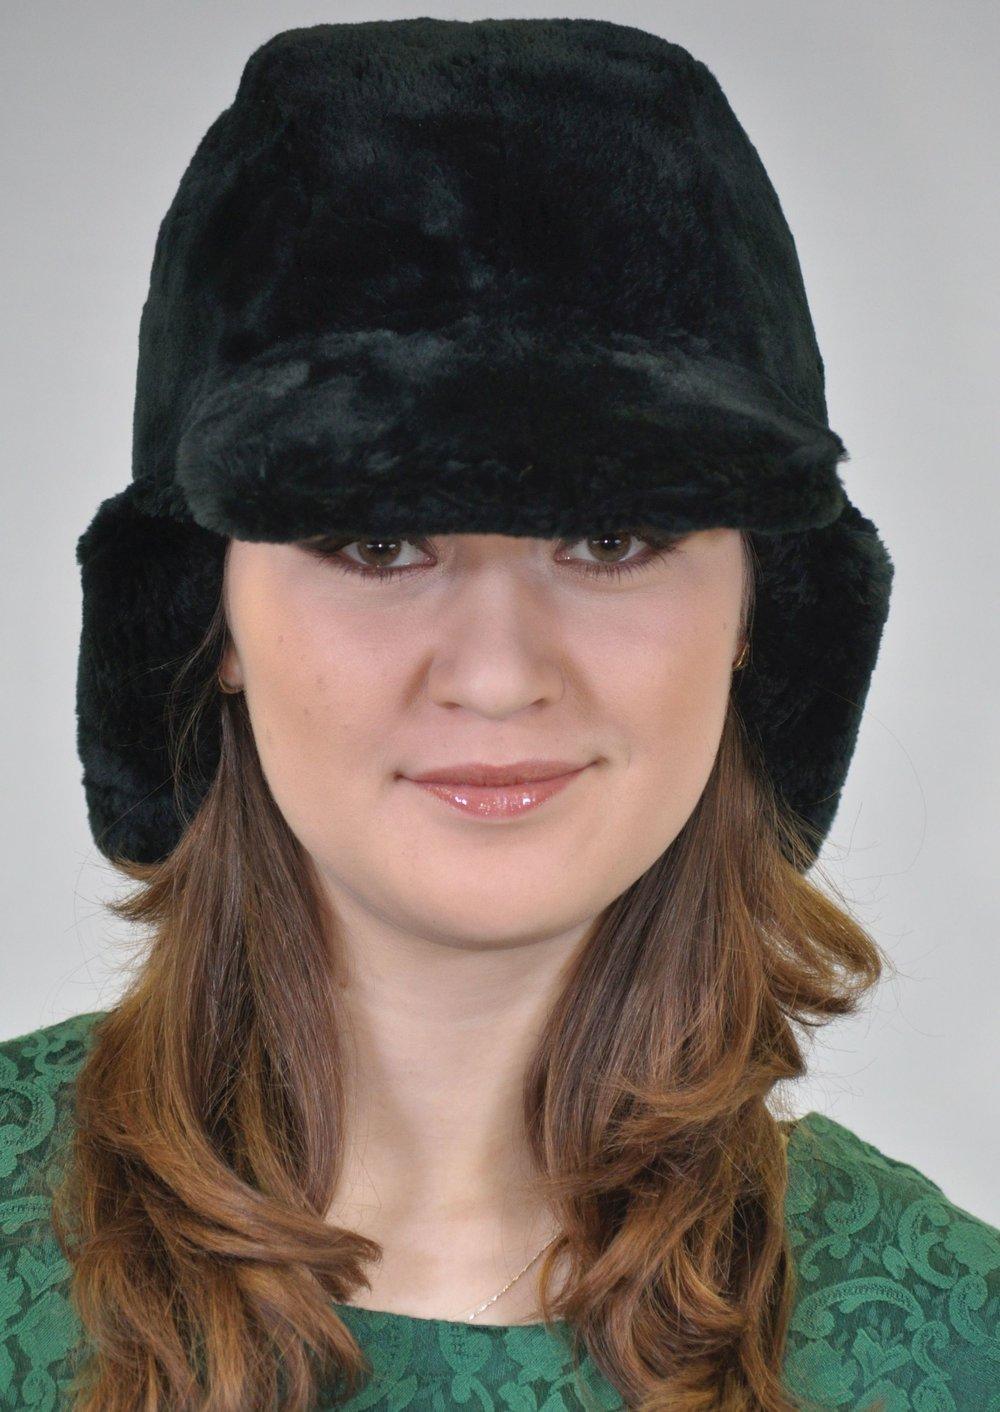 beaver_fur_hat_royal_fur_club_emerald_sheared_beaver_hat_aviator_style_real_fur_hat_2500x3529